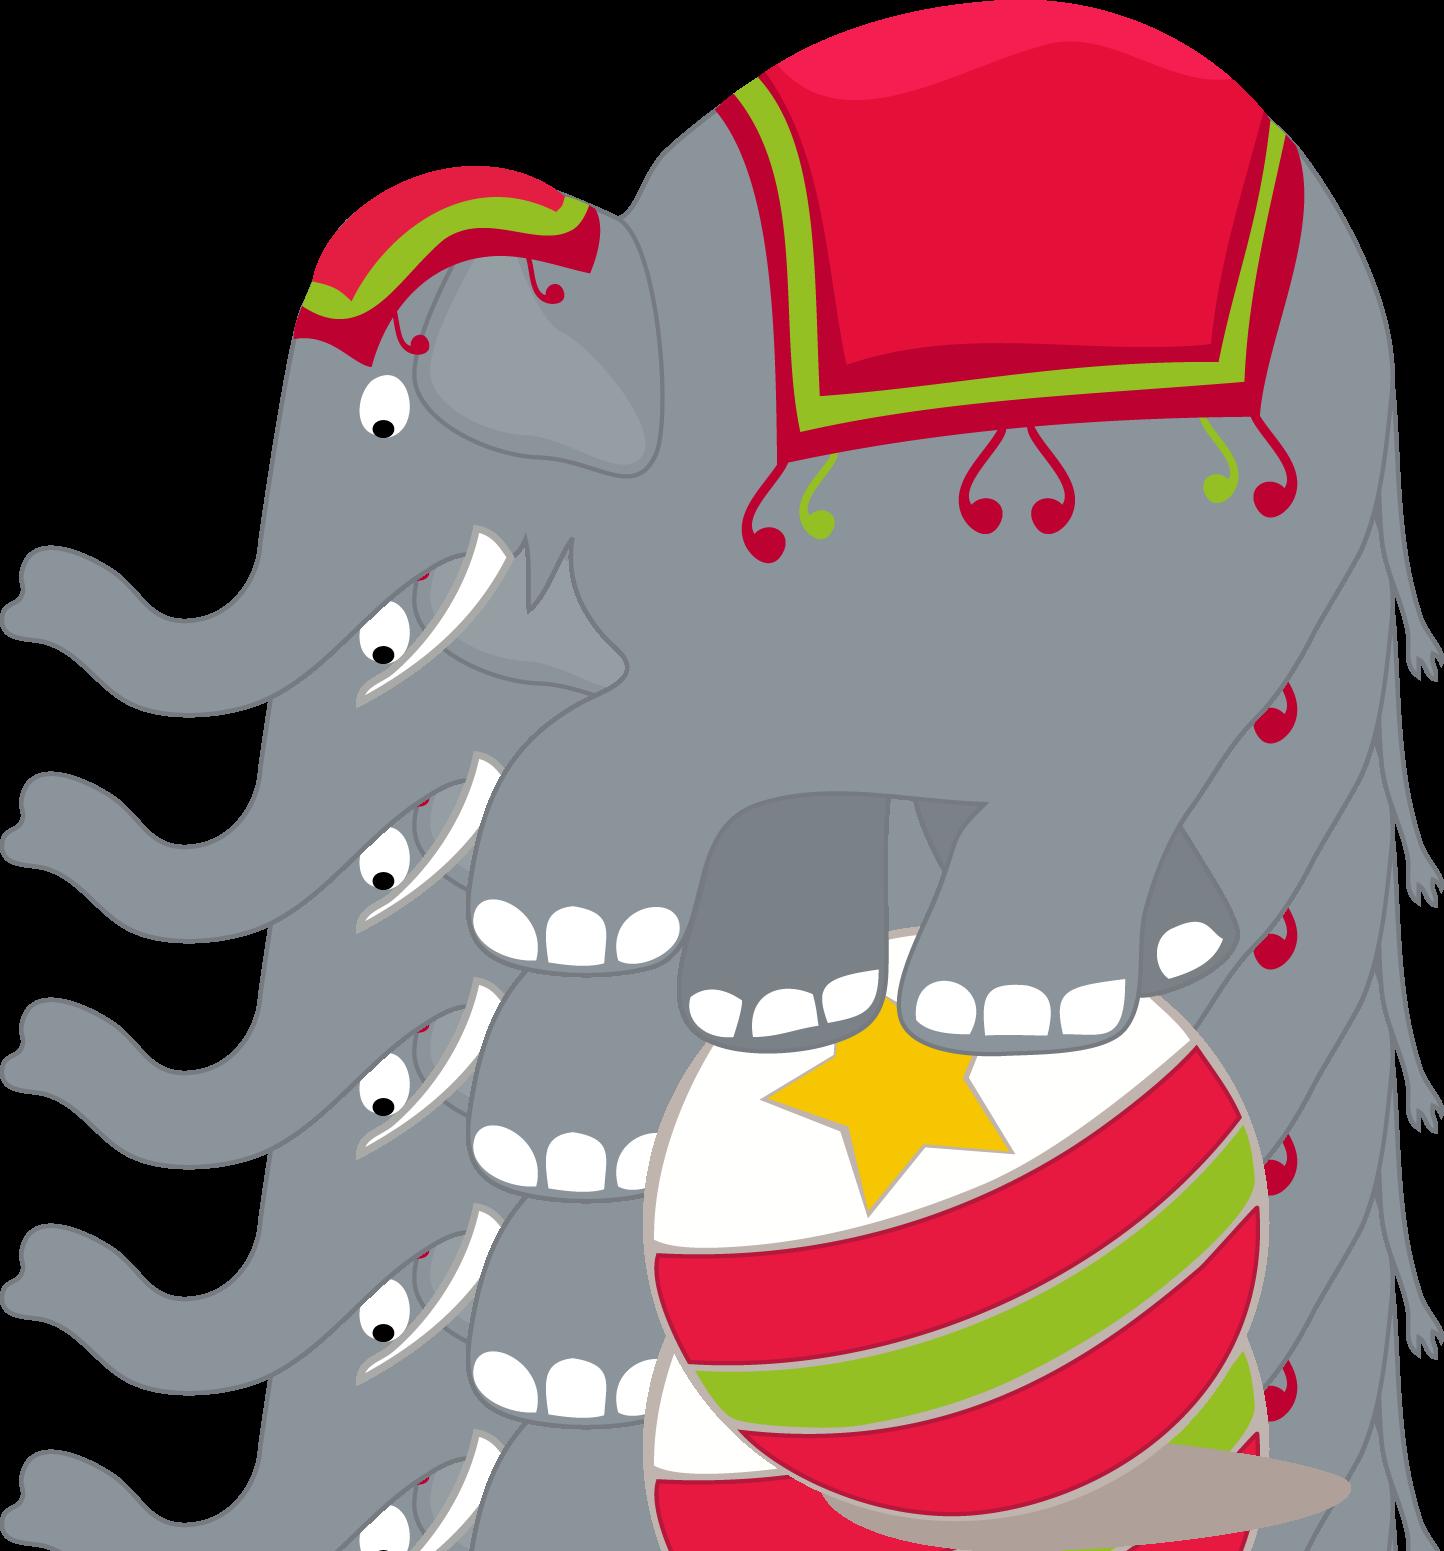 Graduation clipart elephant. Circo png pesquisa google